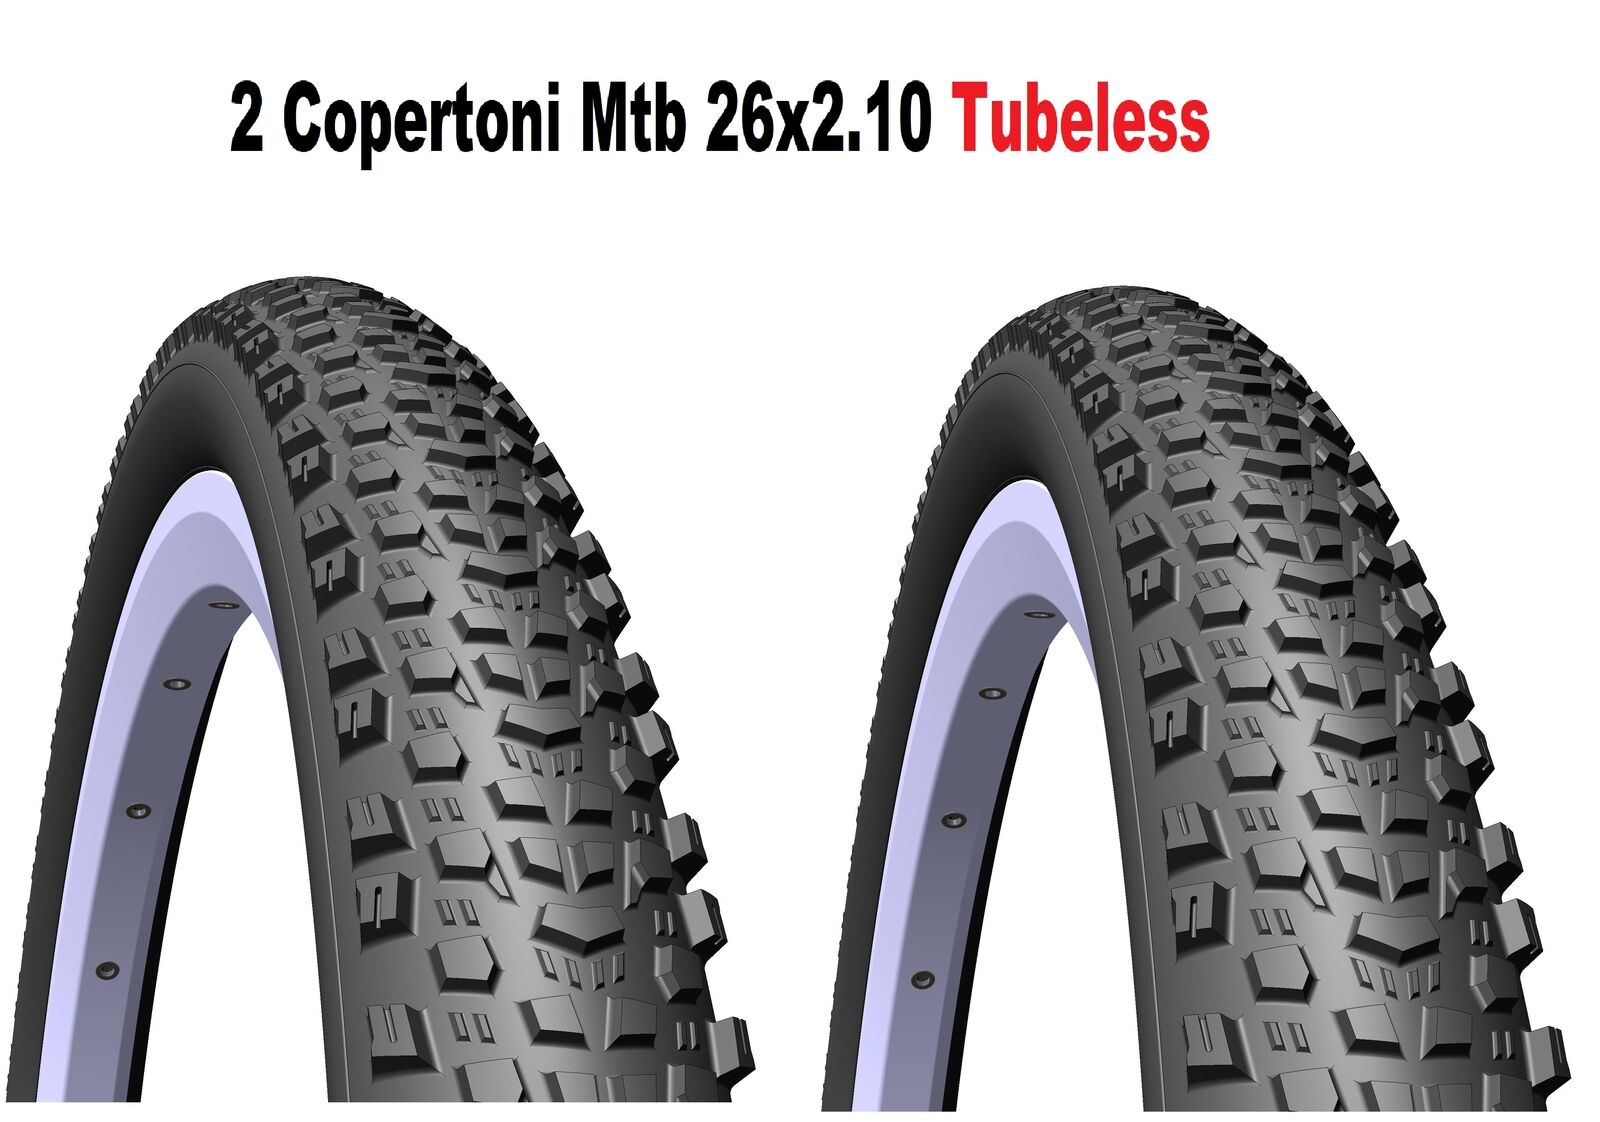 2 Copertoni Mtb 26 Per Bici Bici Bici Da Bicicletta Mitas Scylla Tubeless Supra 26x2.10 | Intelligente e pratico  | Cheapest  ba36d1